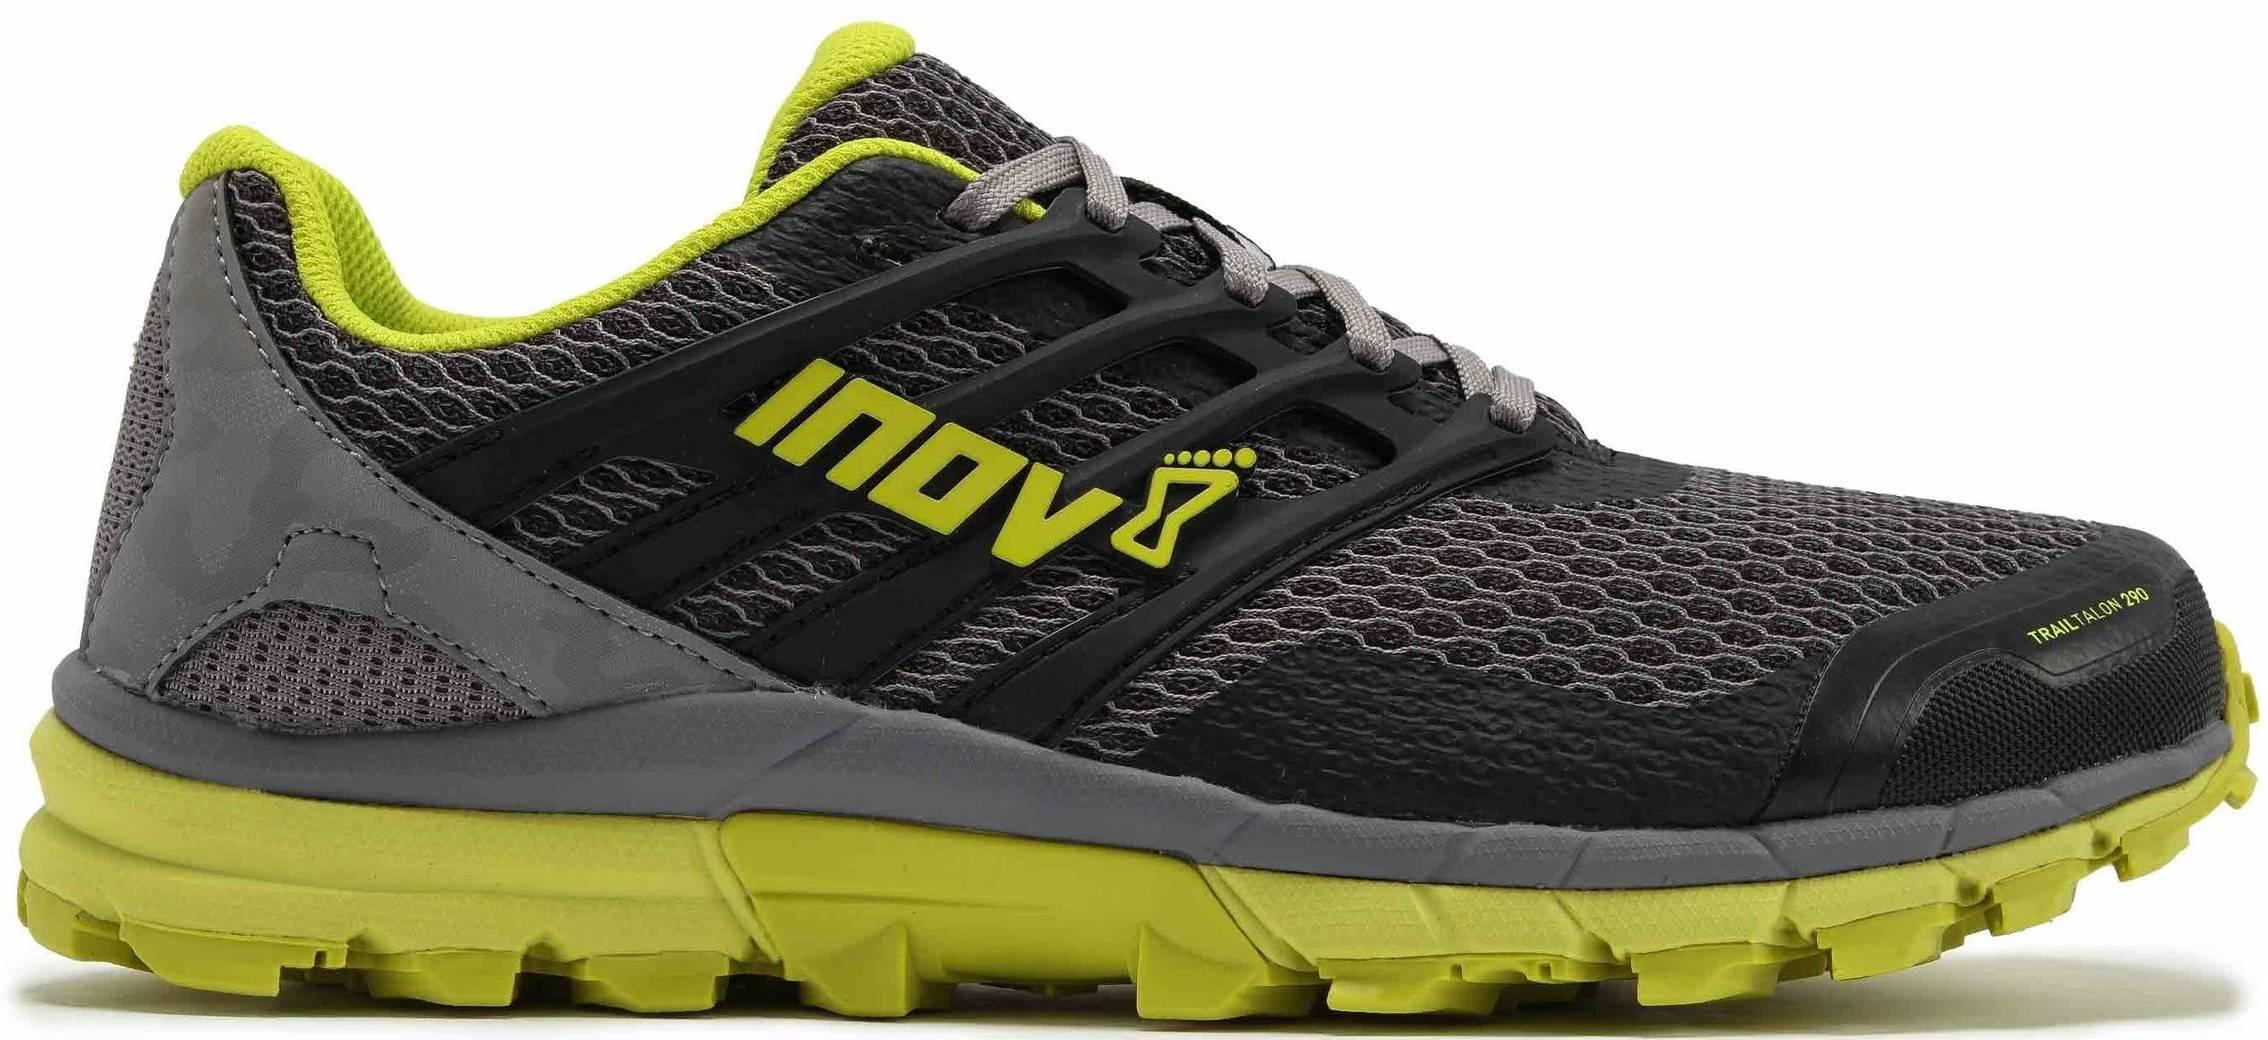 Inov-8 Mens Trailtalon 290 Black /& Blue Path /& Trail Running Trainers Shoes